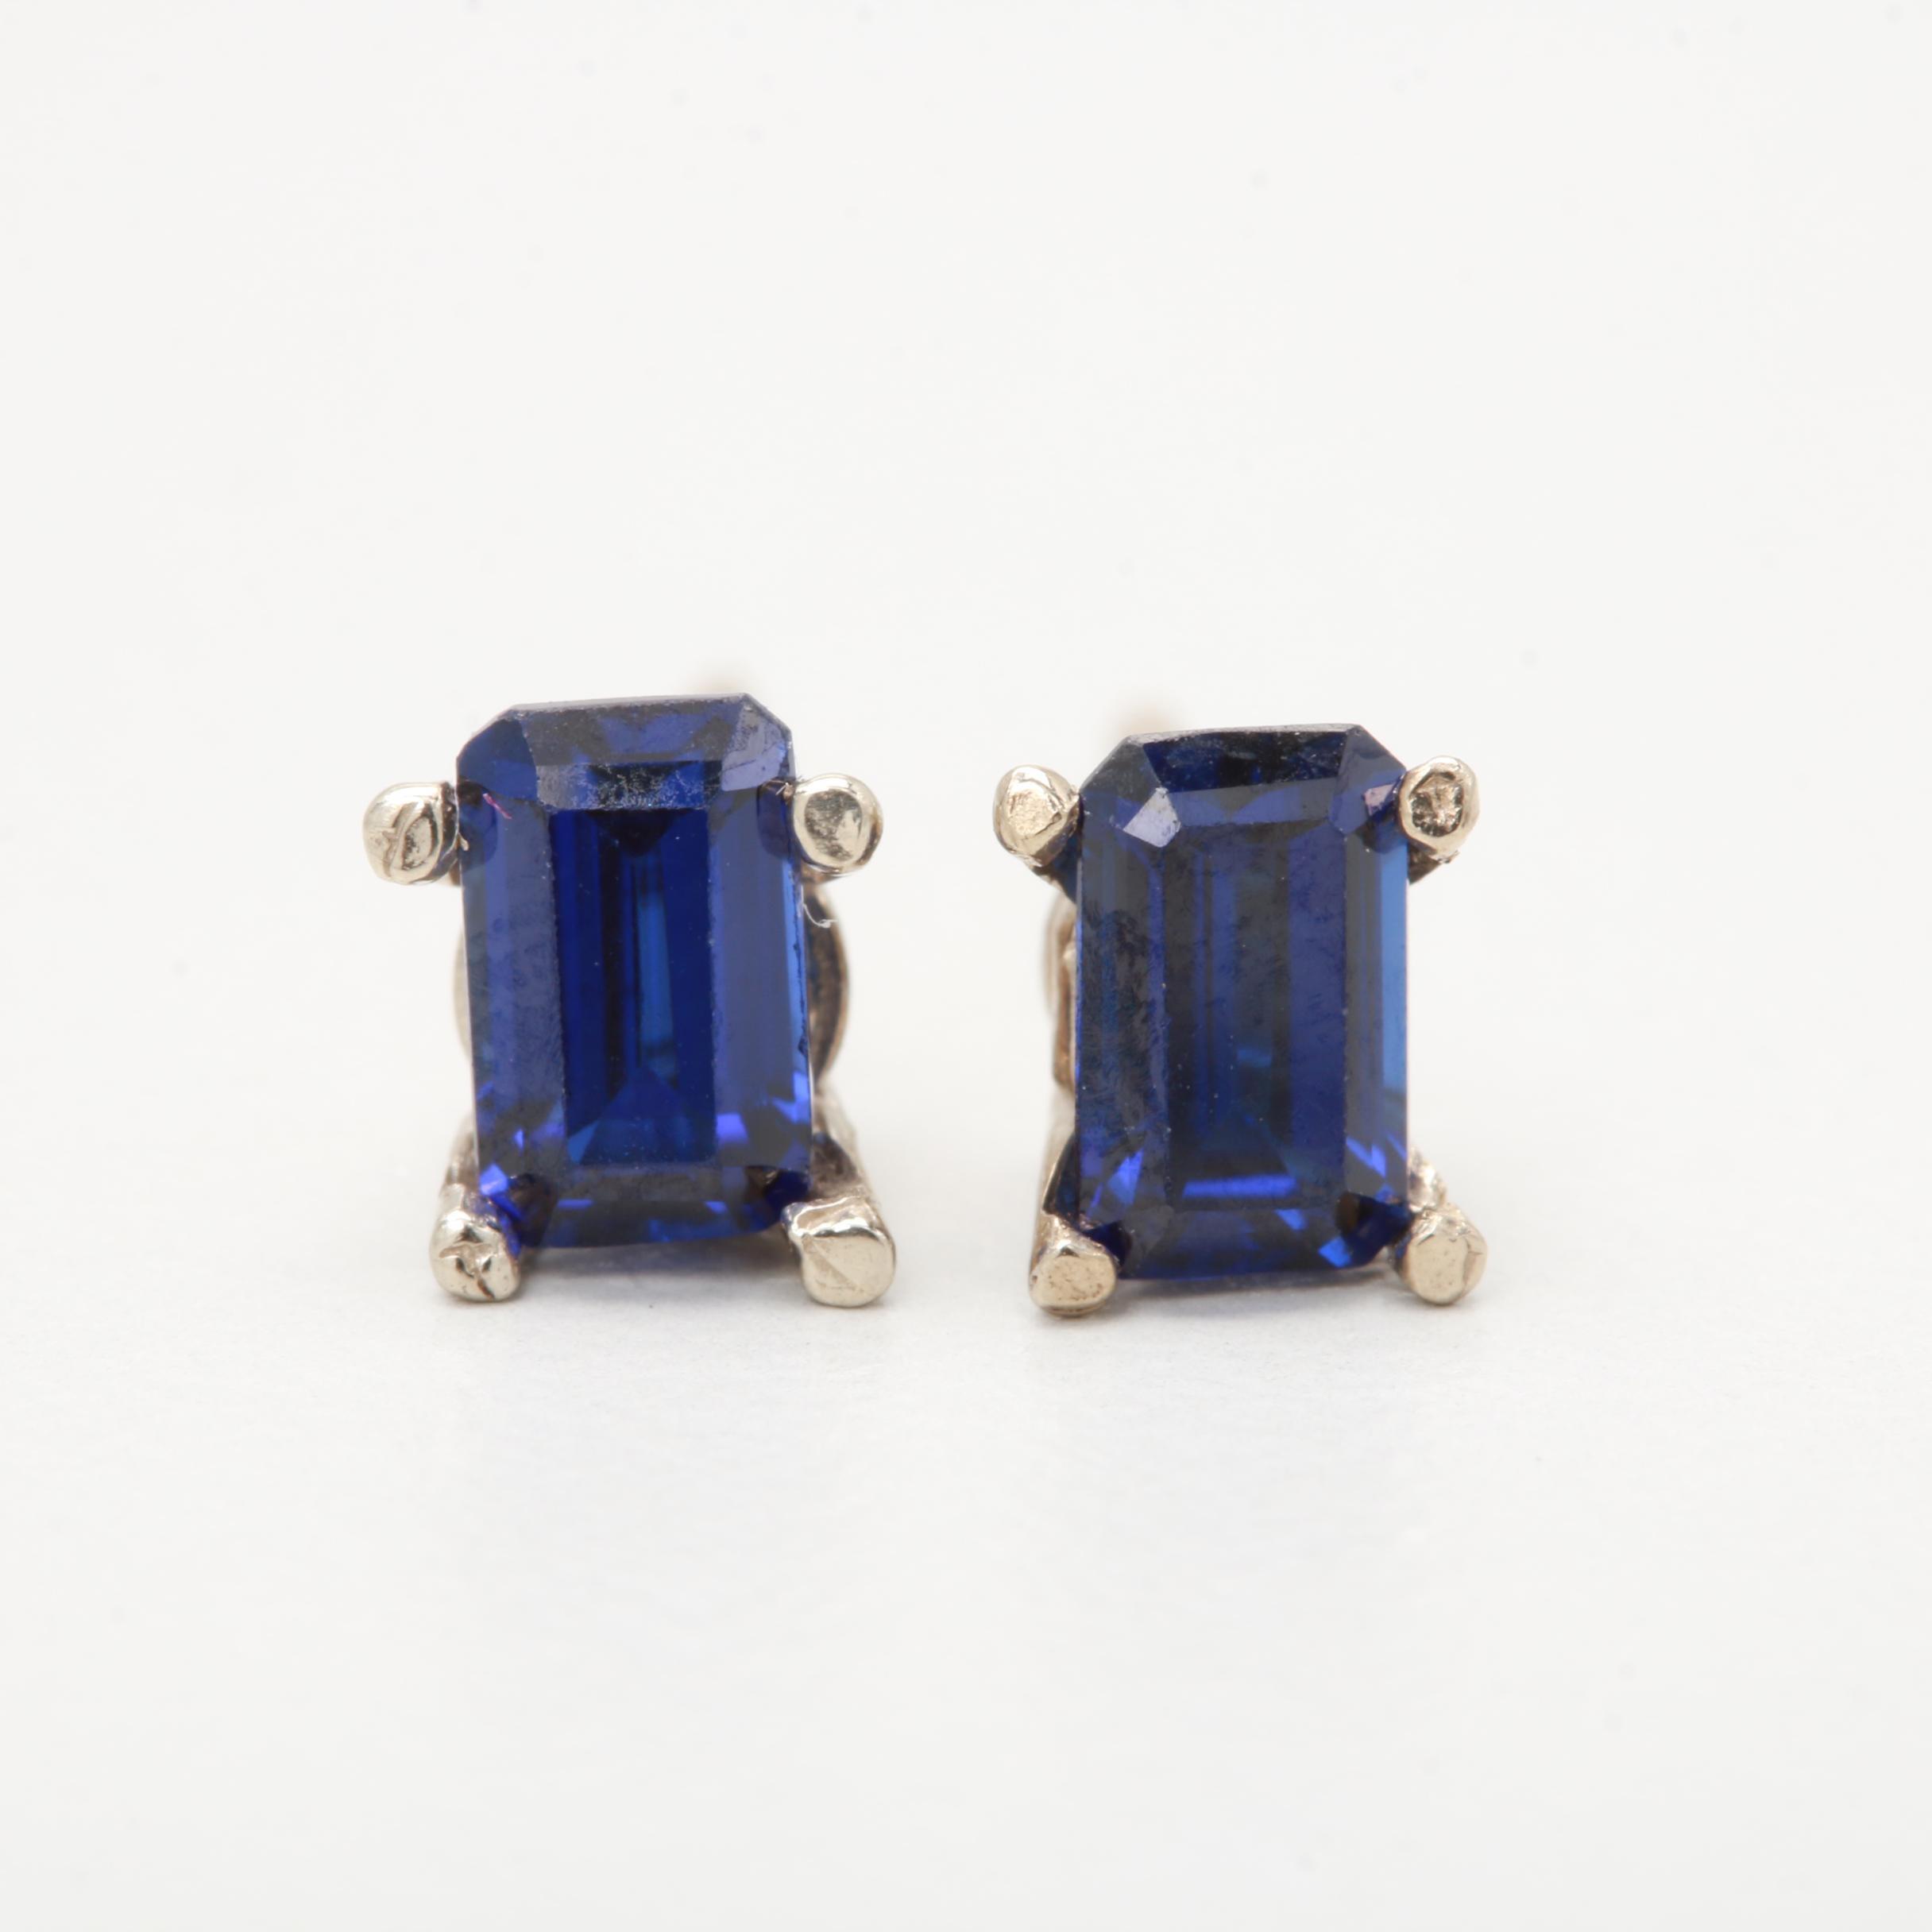 14K White Gold Synthetic Sapphire Stud Earrings